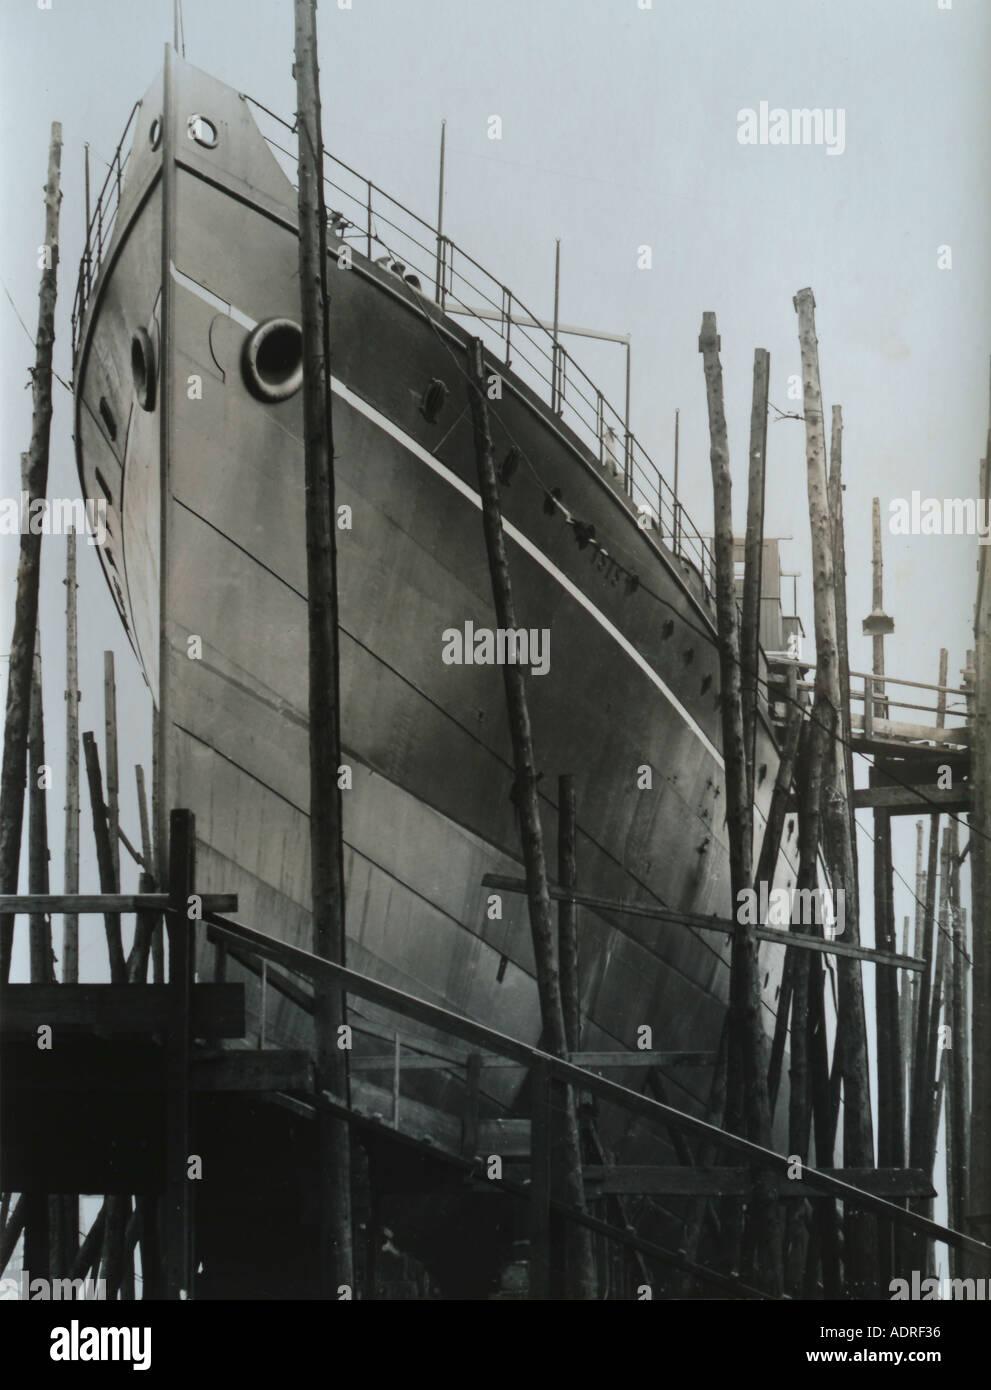 UK Scotland Greenock shipyard of the 1890 s building the SS Isis - Stock Image